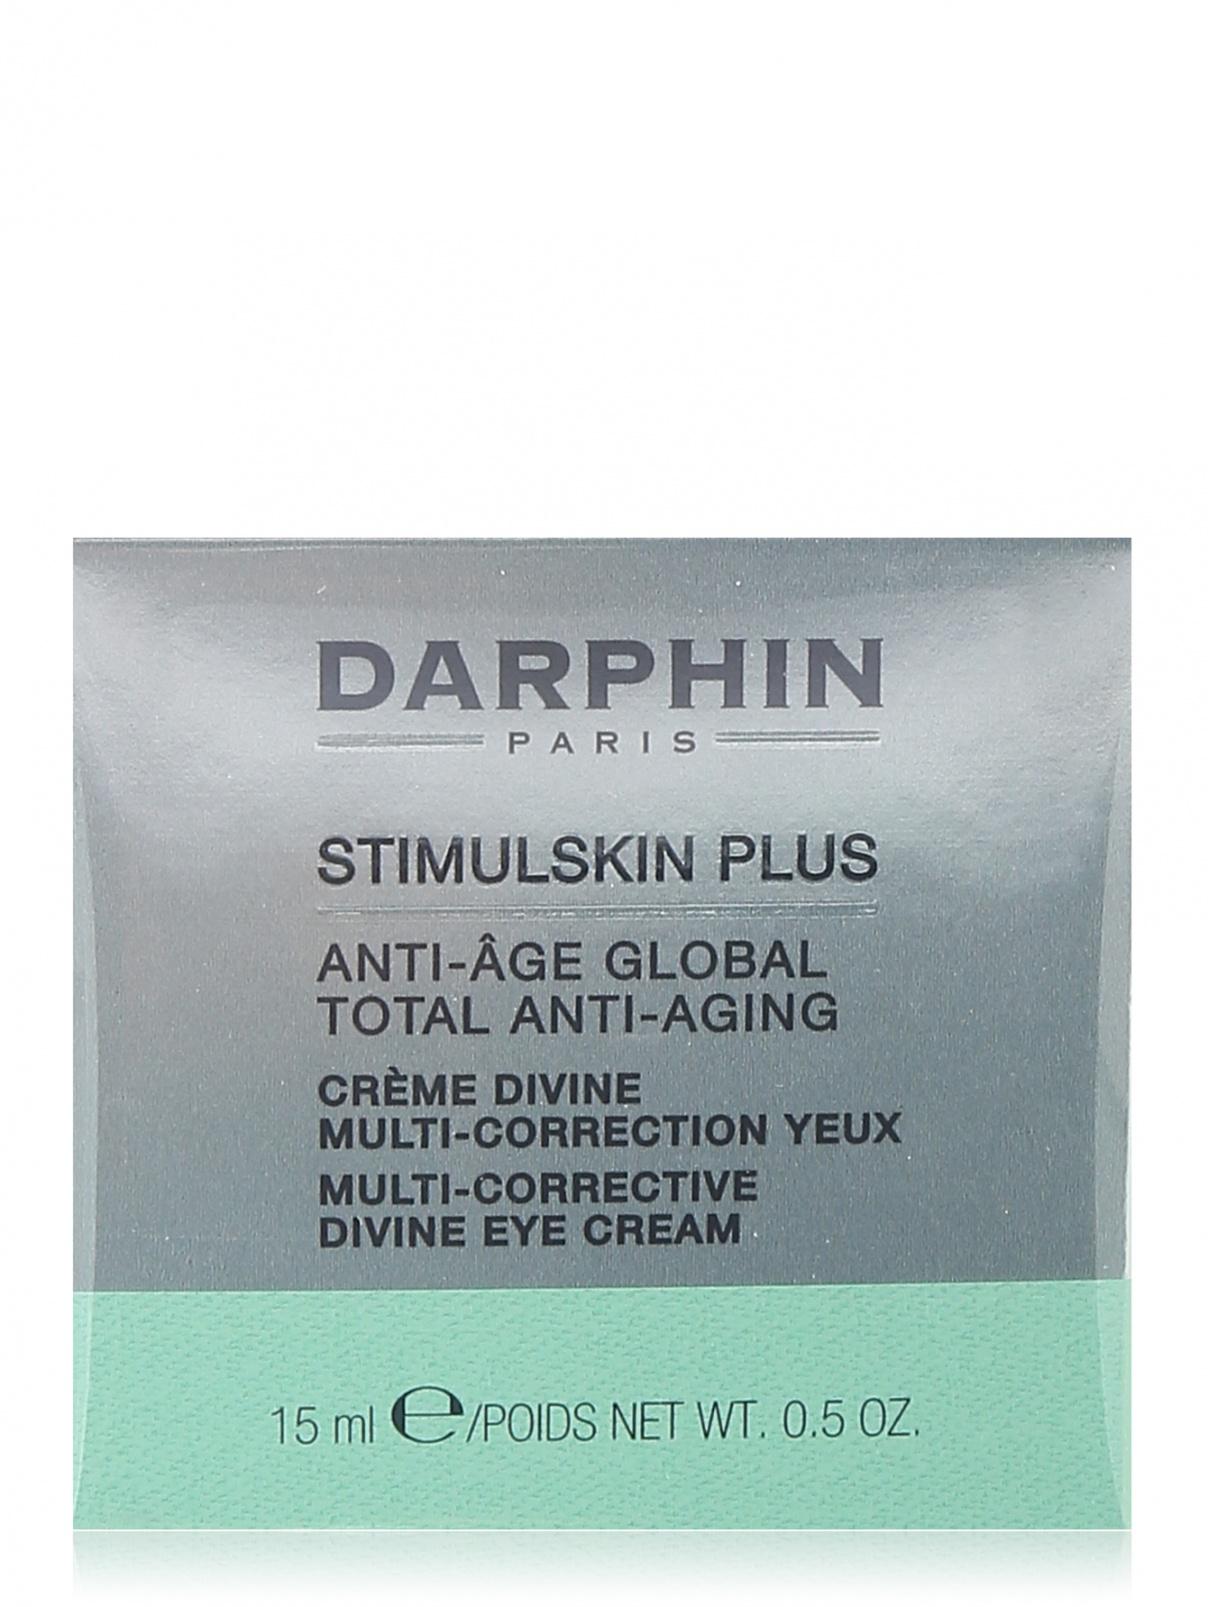 Крем для глаз 15 мл Multi-corrective Divine Stimulskin Darphin  –  Общий вид